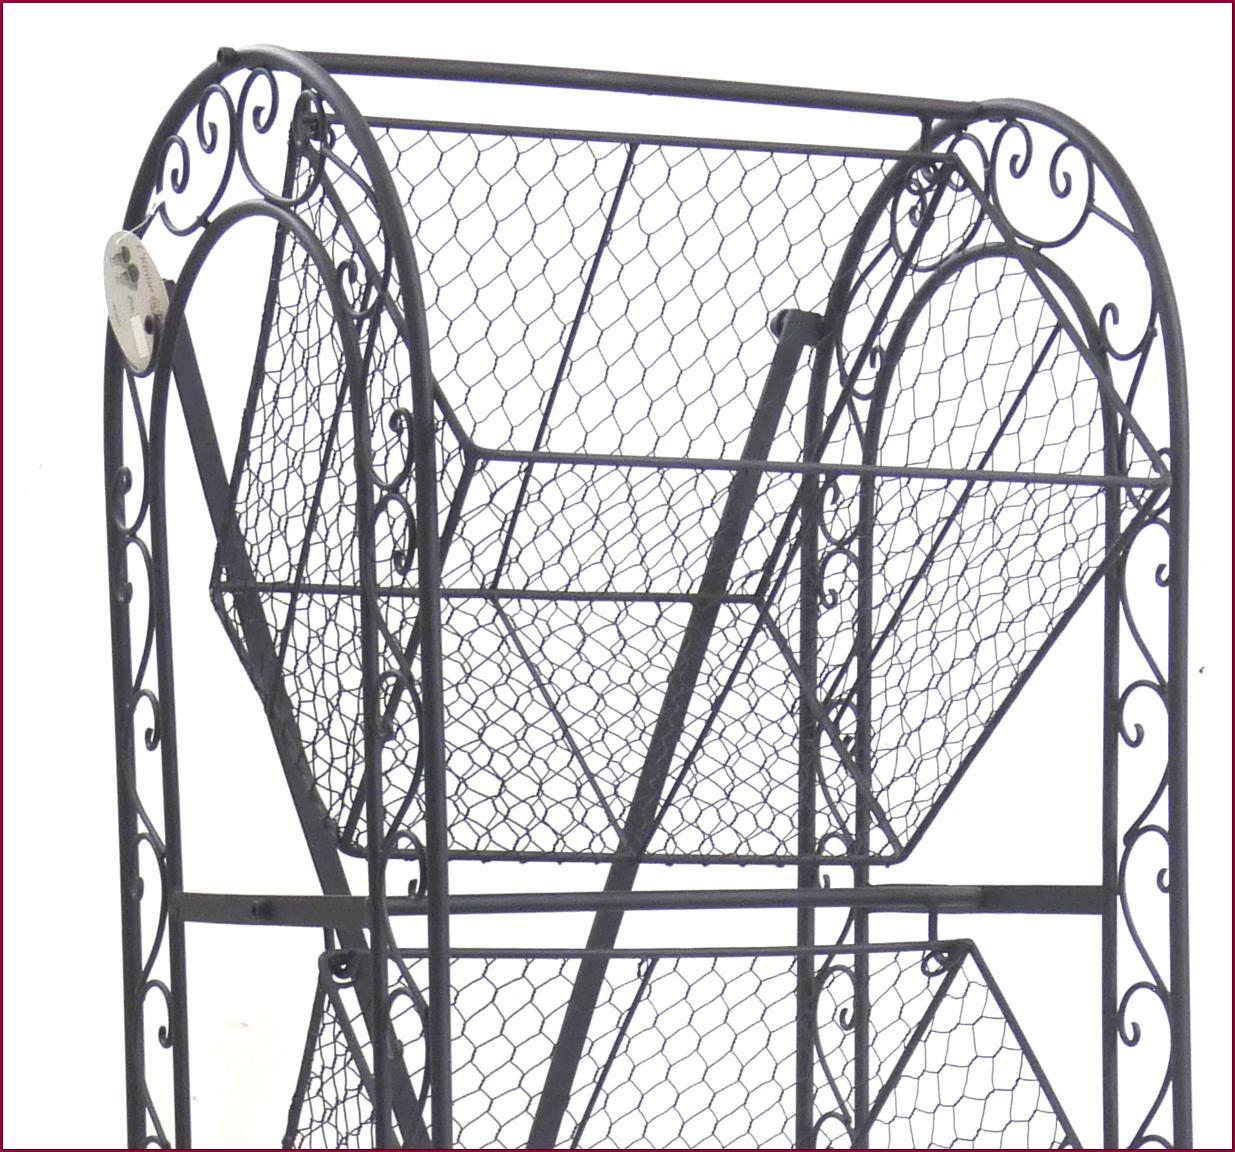 casier metal bas sammlung von design. Black Bedroom Furniture Sets. Home Design Ideas